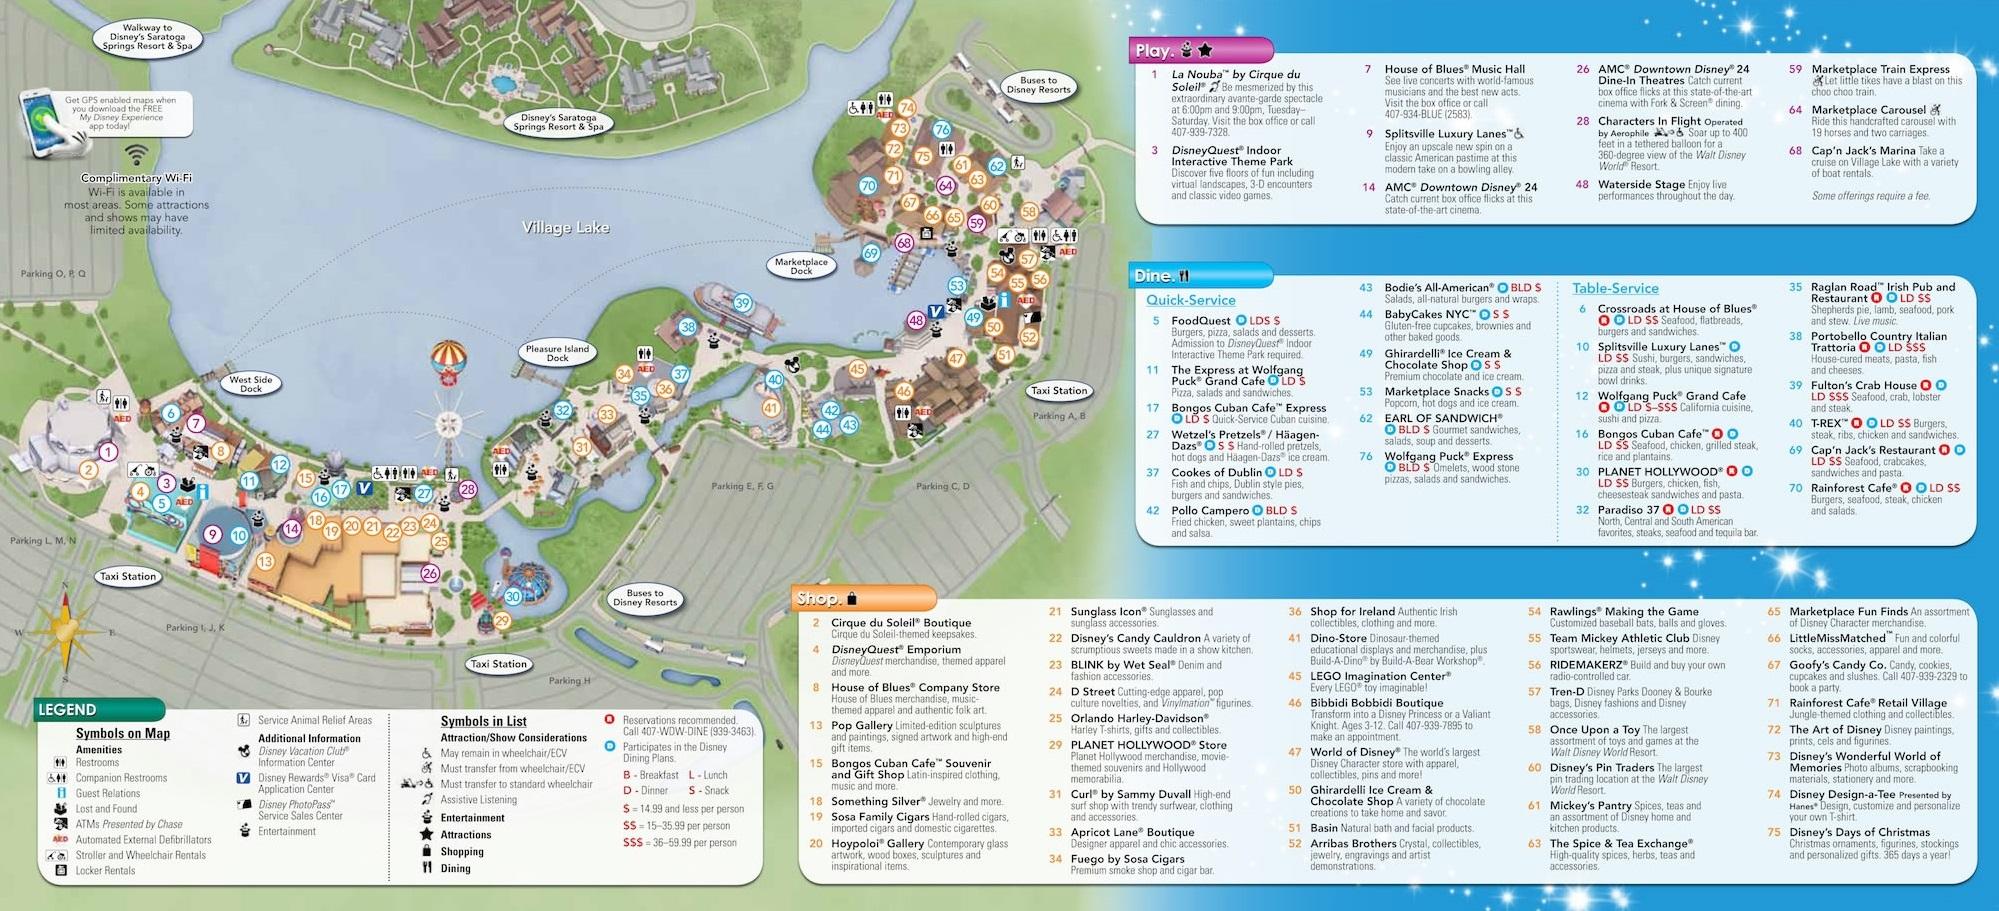 Walt Disney World Maps | WDW Planning on